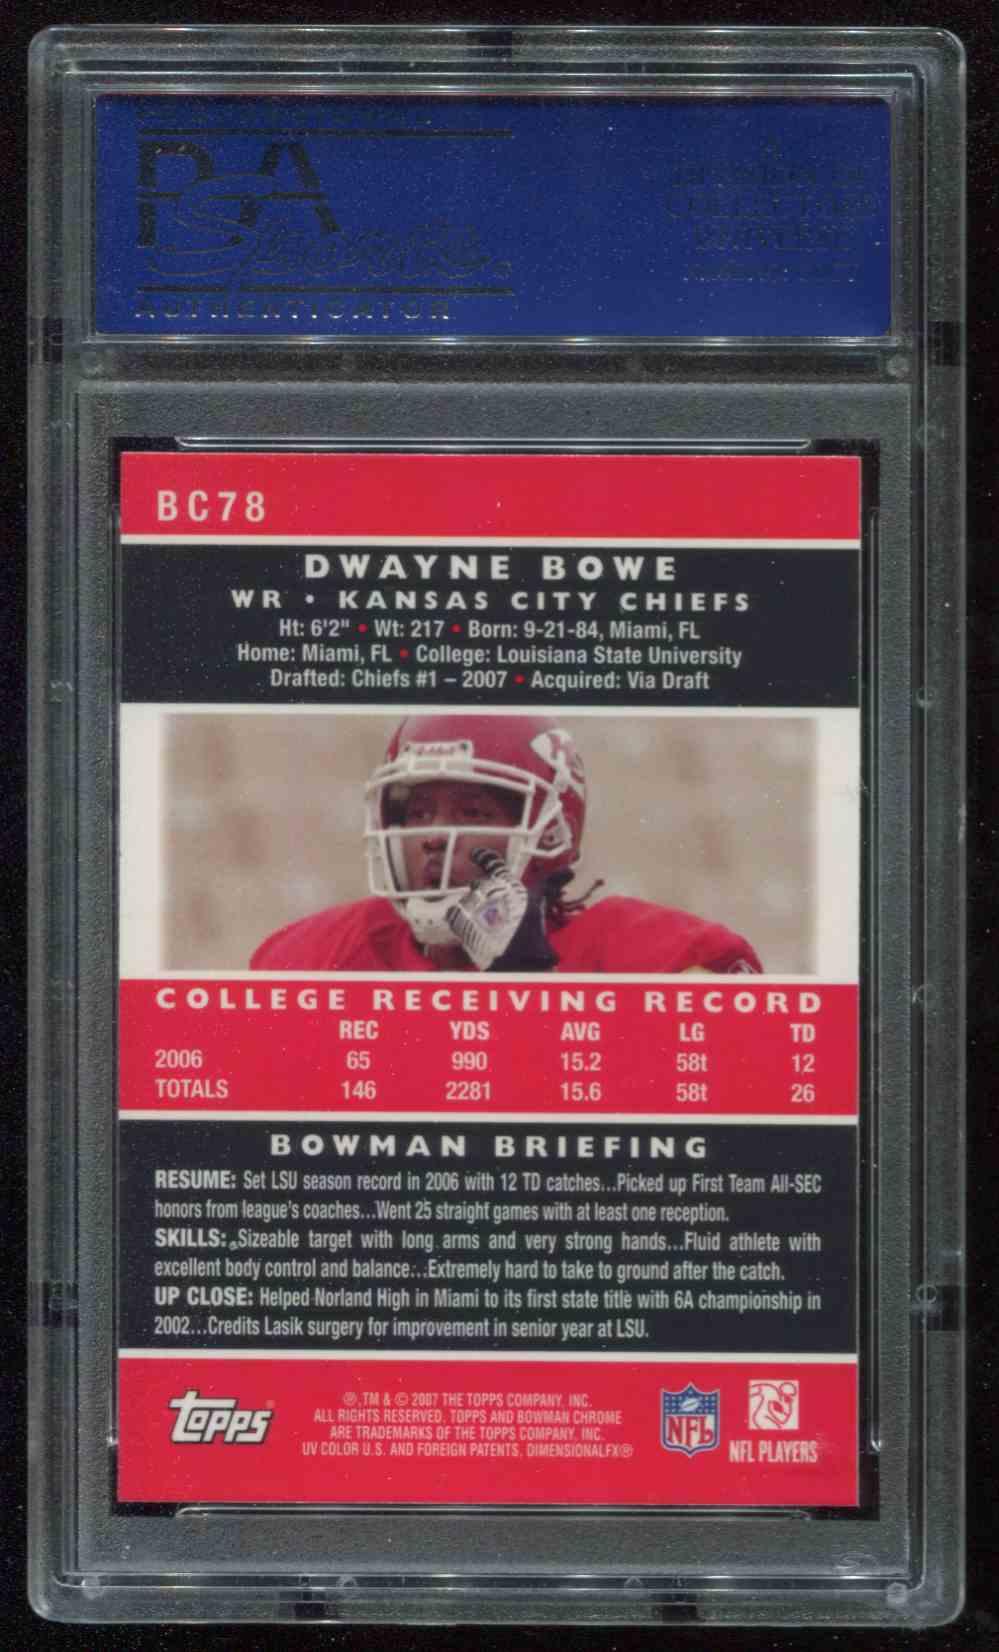 2007 Bowman Chrome Dwayne Bowe #BC78 card back image